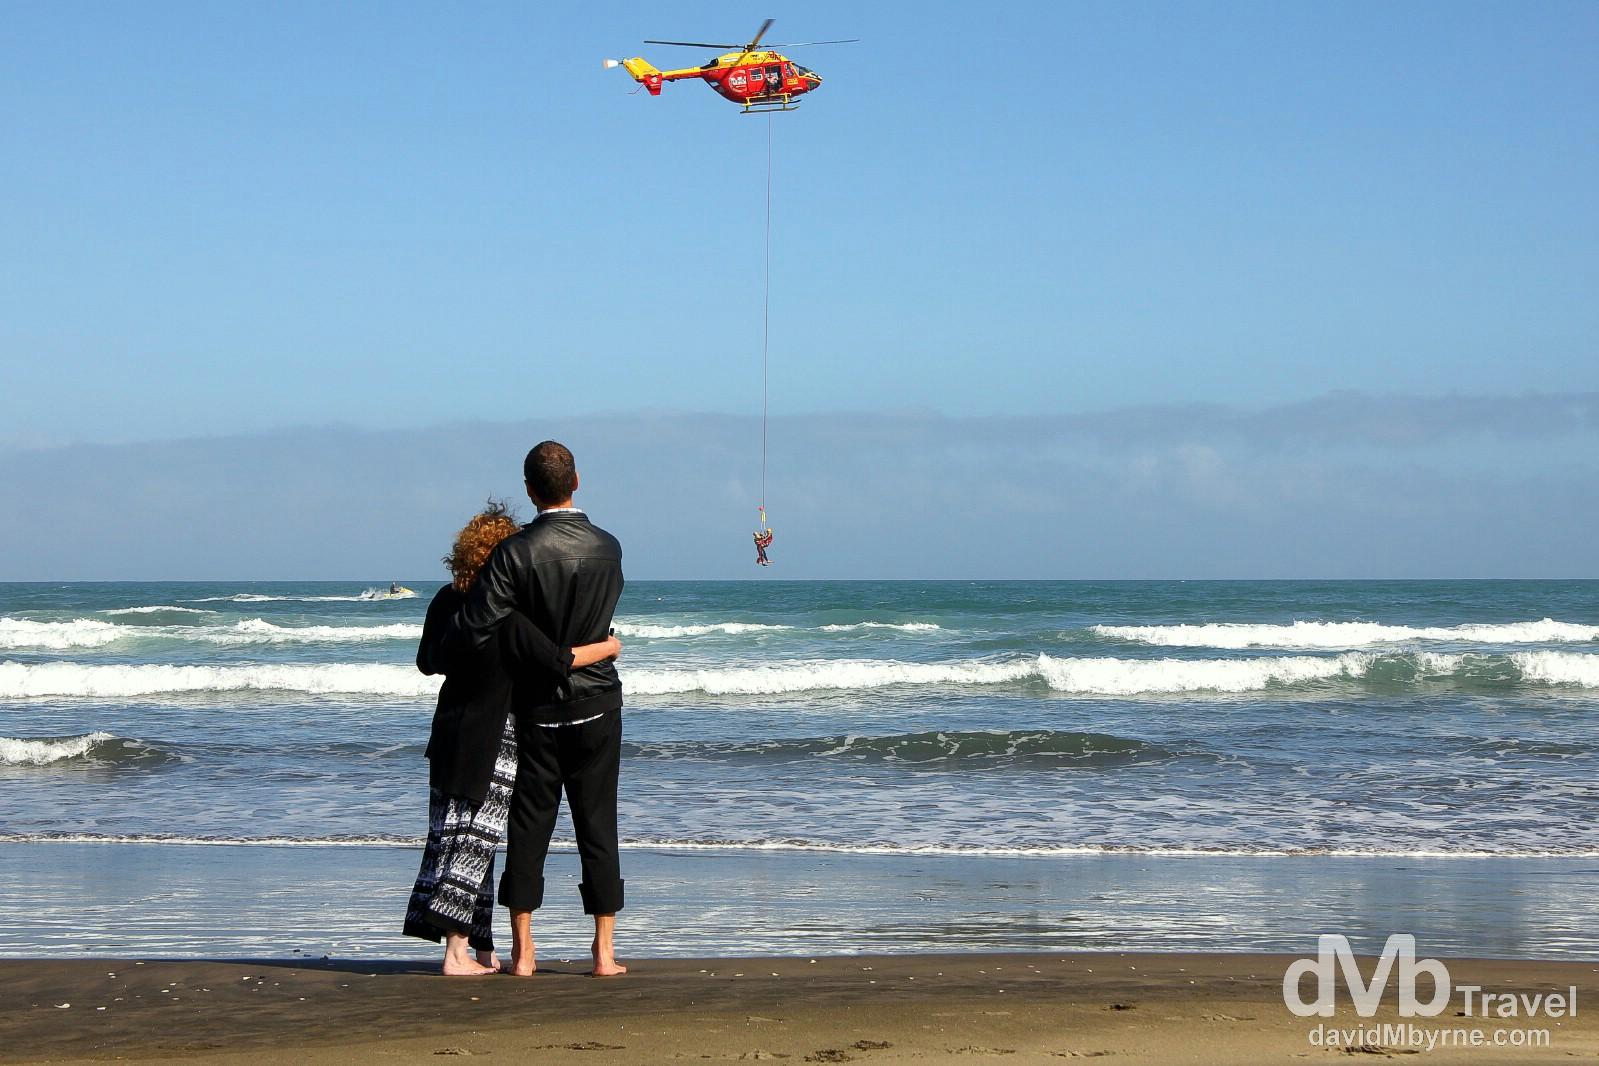 Coastguard rescue drills off the black sand Muriwai Beach, North Island, New Zealand. April 27th 2012.